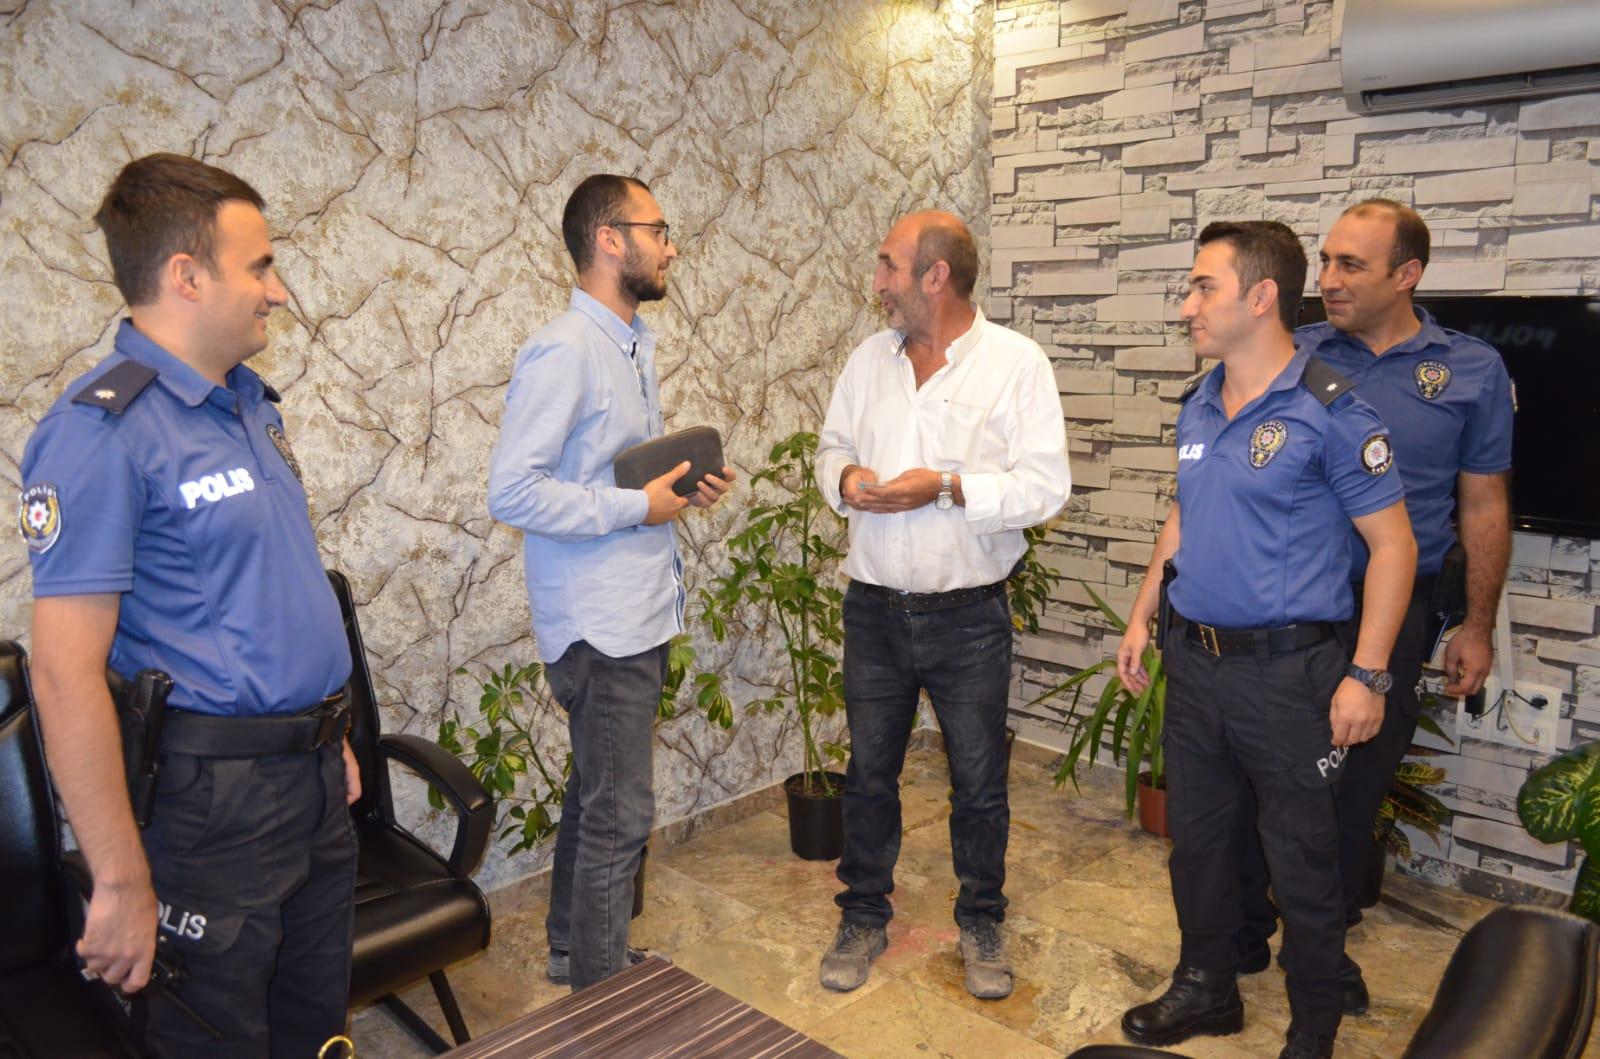 Azeri Turist Cüzdanını Bulan Şoföre 500 TL Ödül Verdi